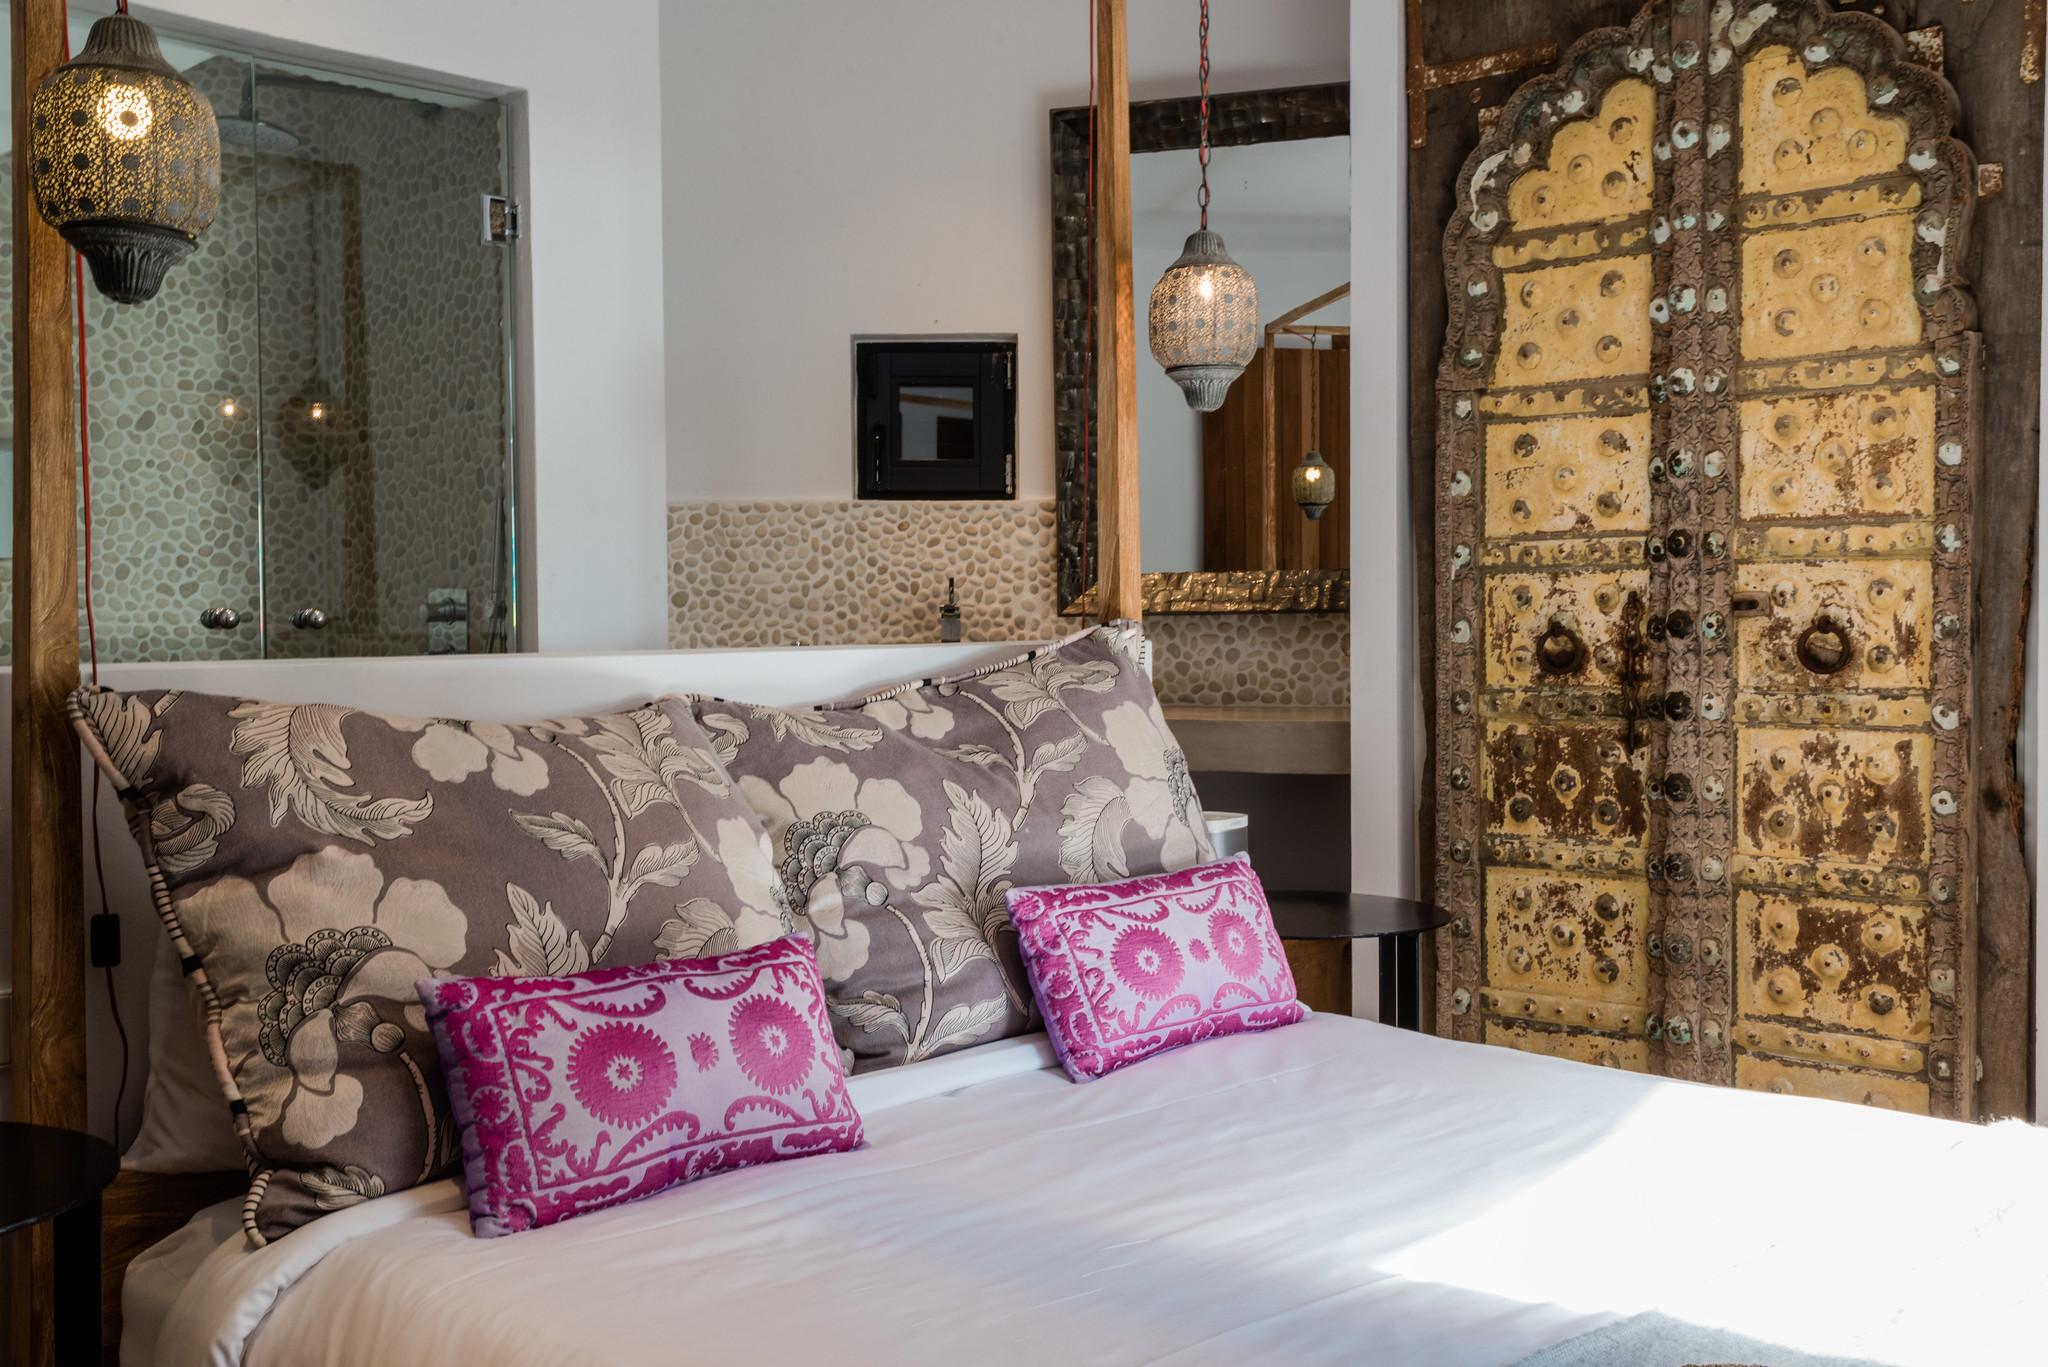 https://www.white-ibiza.com/wp-content/uploads/2020/05/white-ibiza-villas-casa-amalia-interior-bedroom.jpg